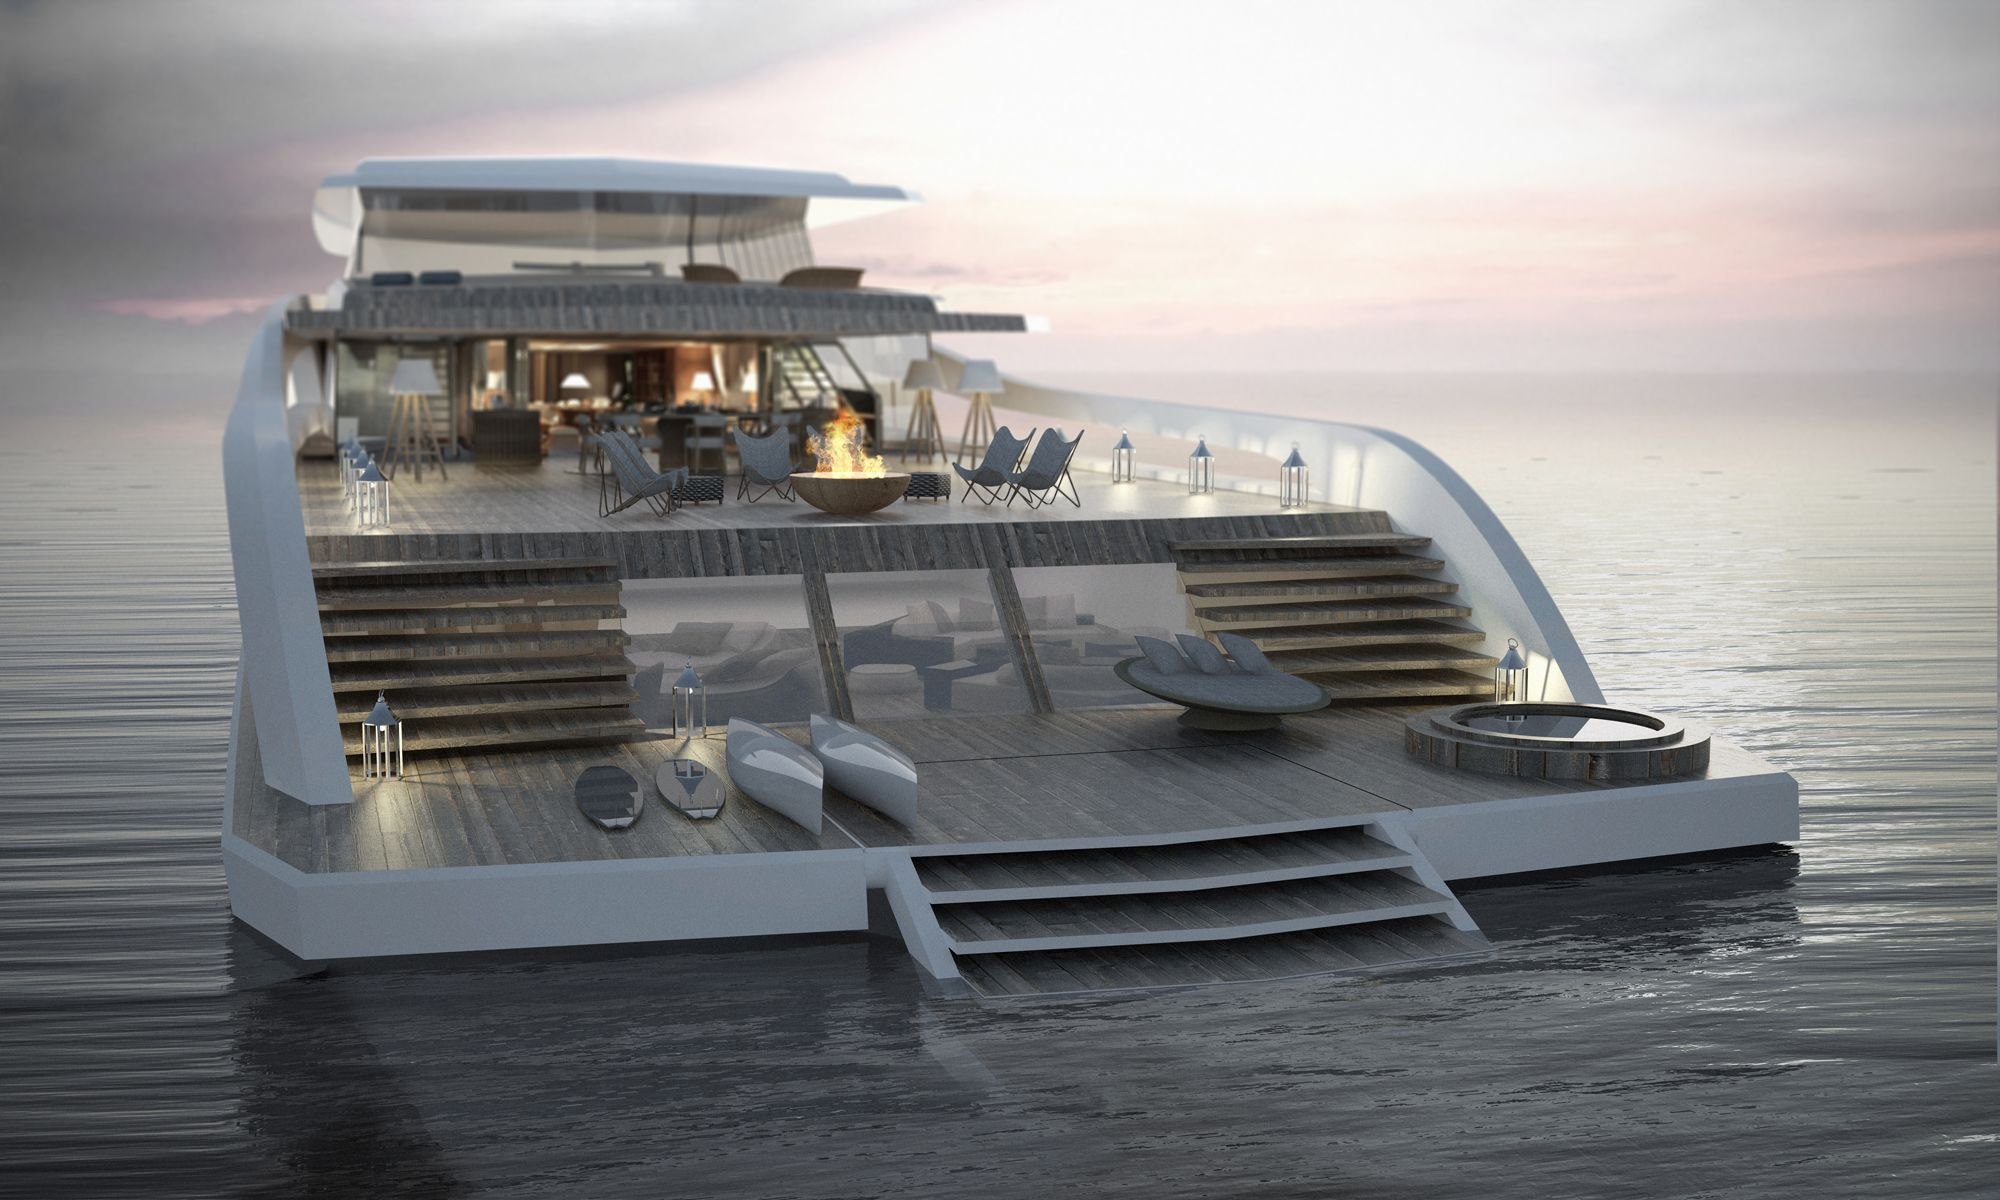 Pastrovich Studio, 55m x-easy yacht